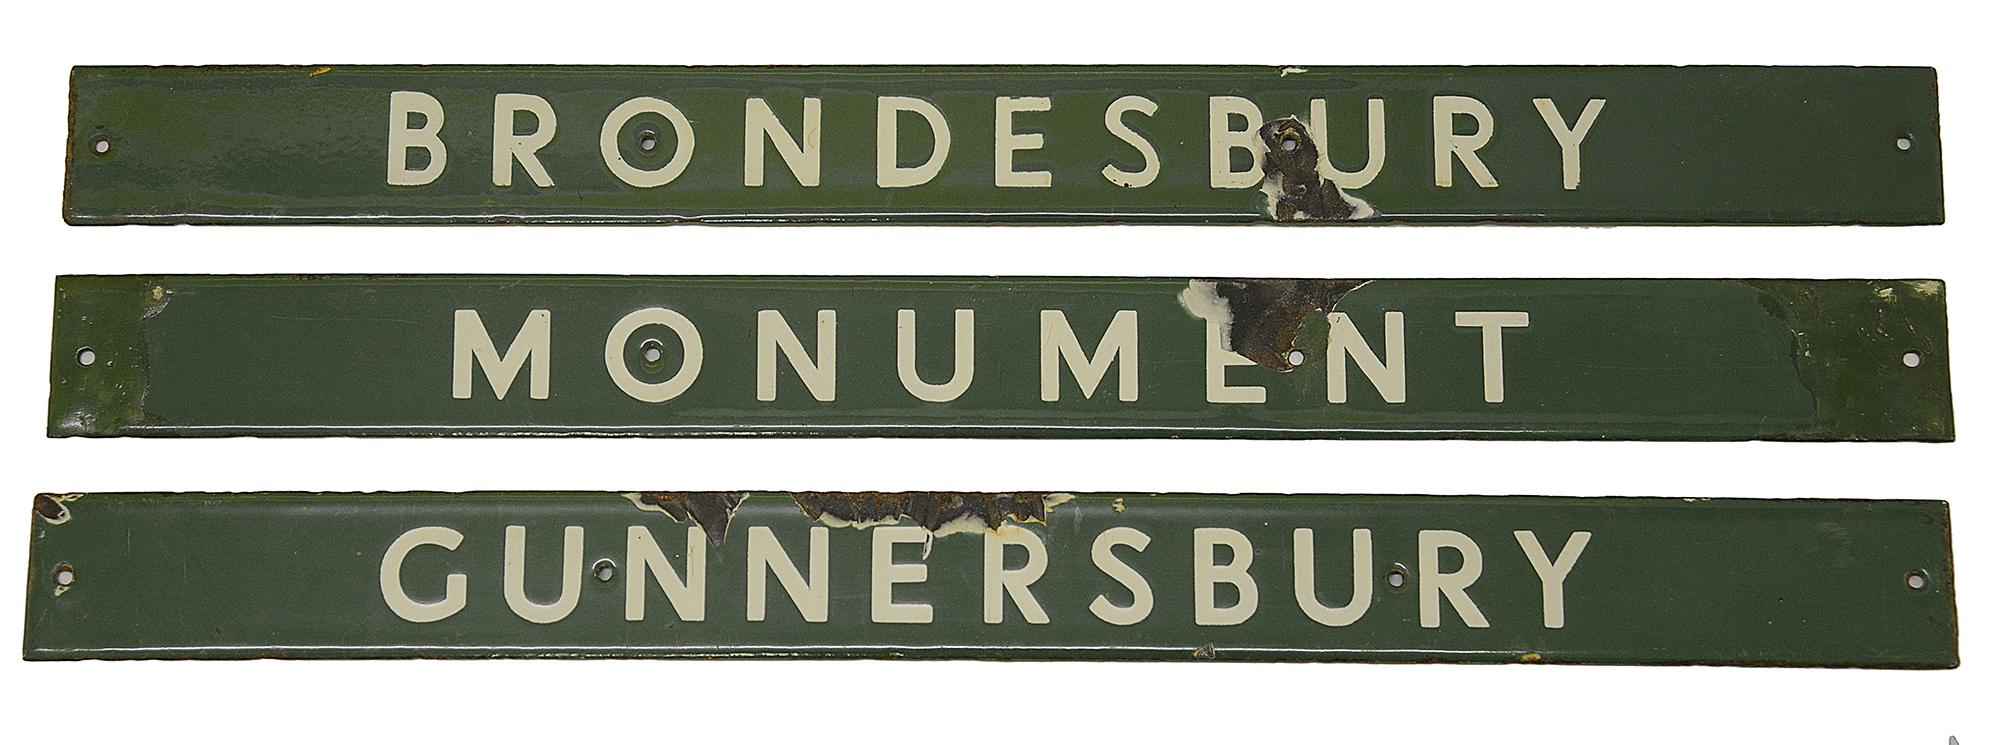 Four London Underground enamel destination plates for the District line, - Image 2 of 4